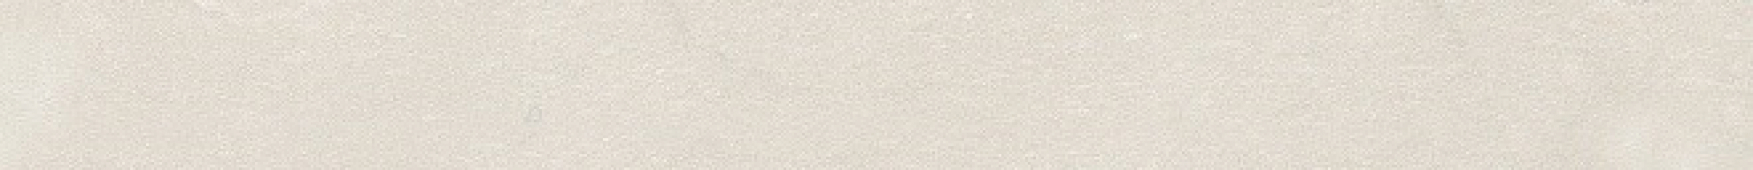 Бордюр Рамбла беж обрезной 25х2,5х19